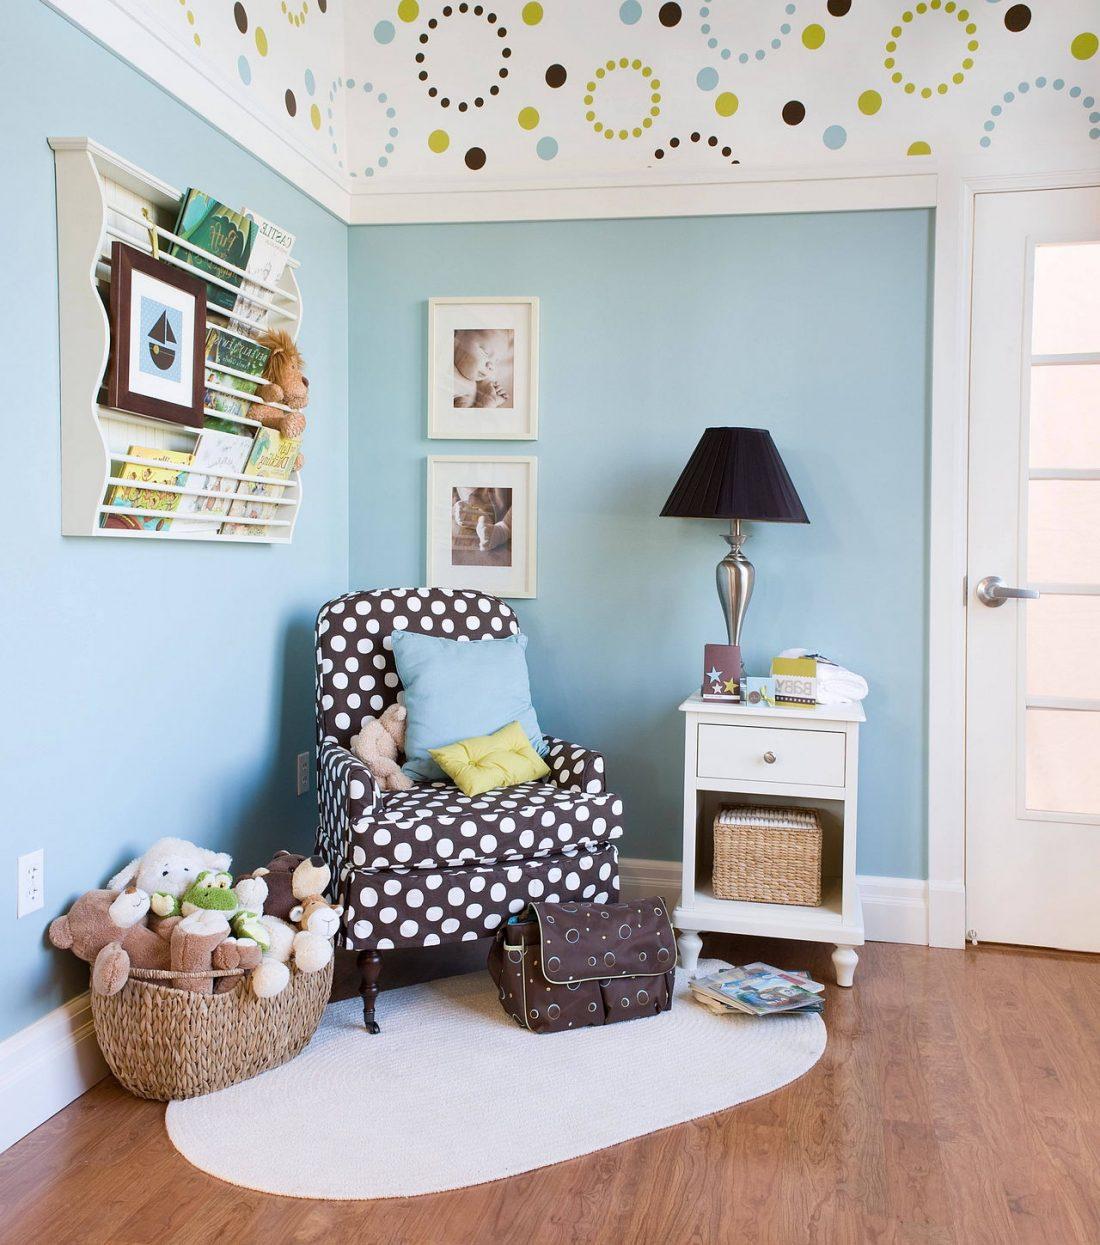 Детская комната в стиле прованс 2